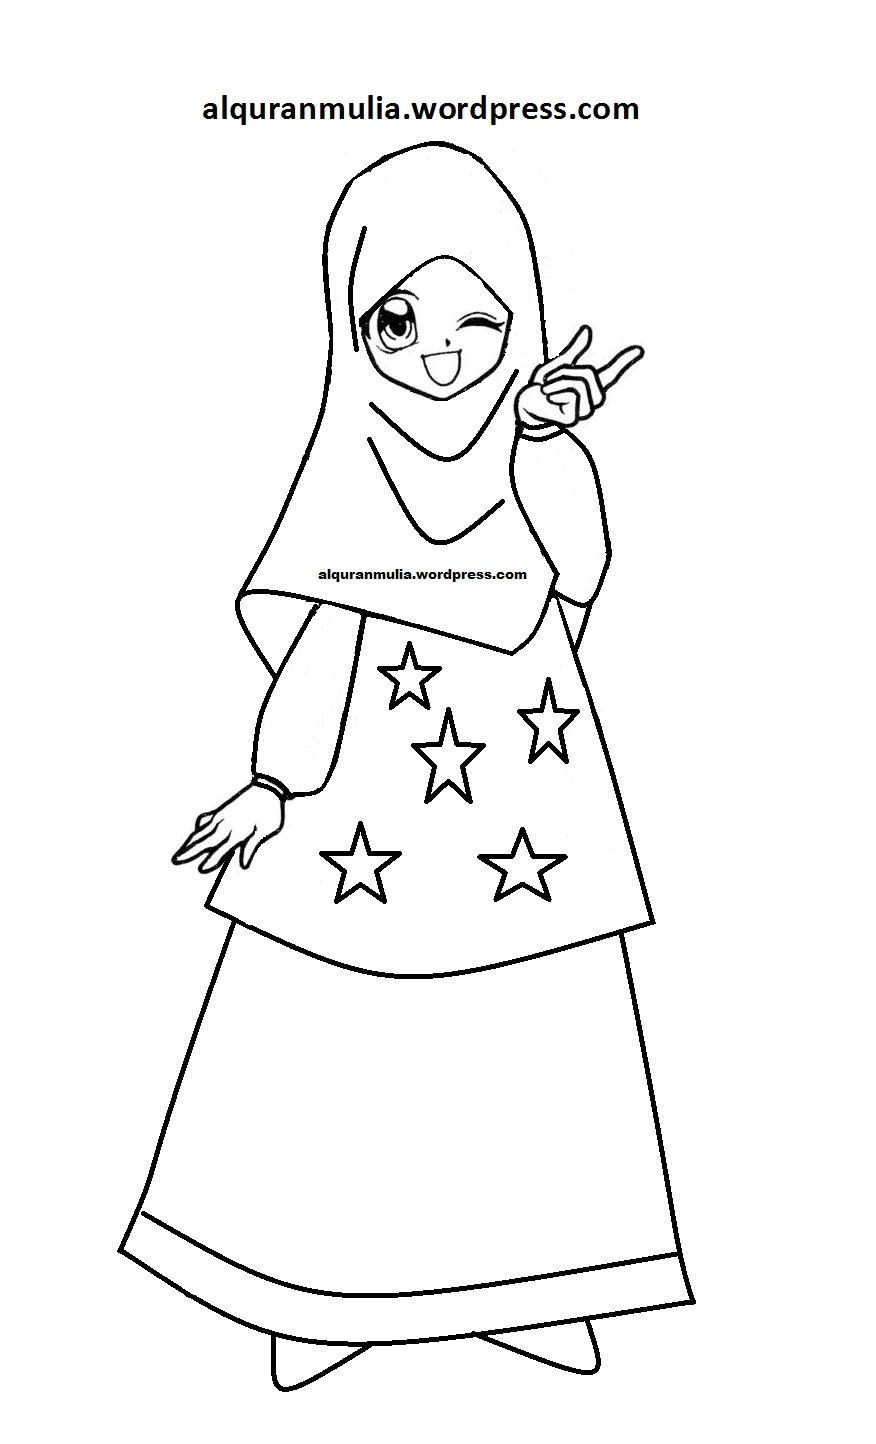 Mewarnai Gambar Kartun Anak Muslimah